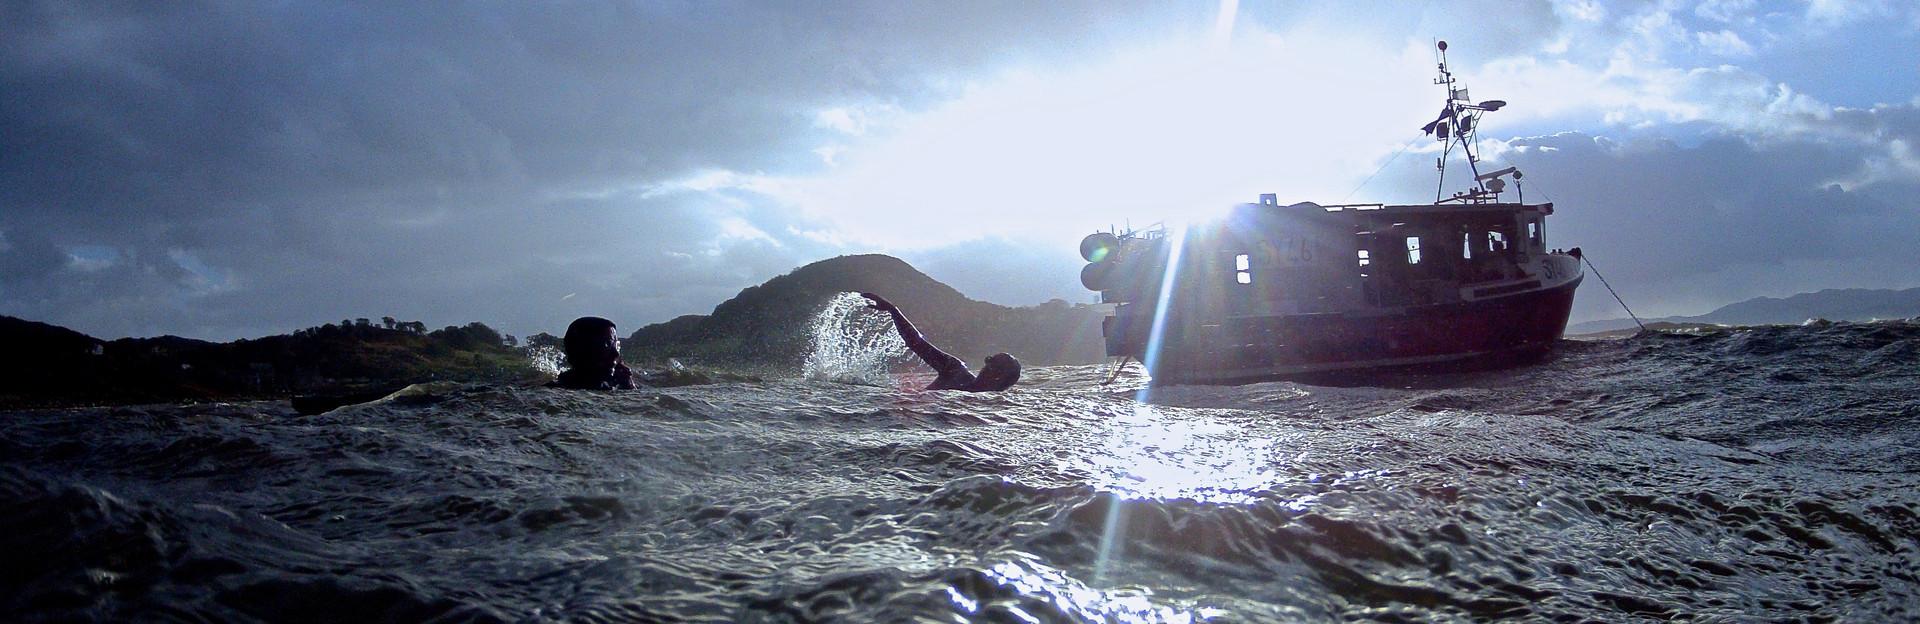 Wild swimming, Sound of Jura